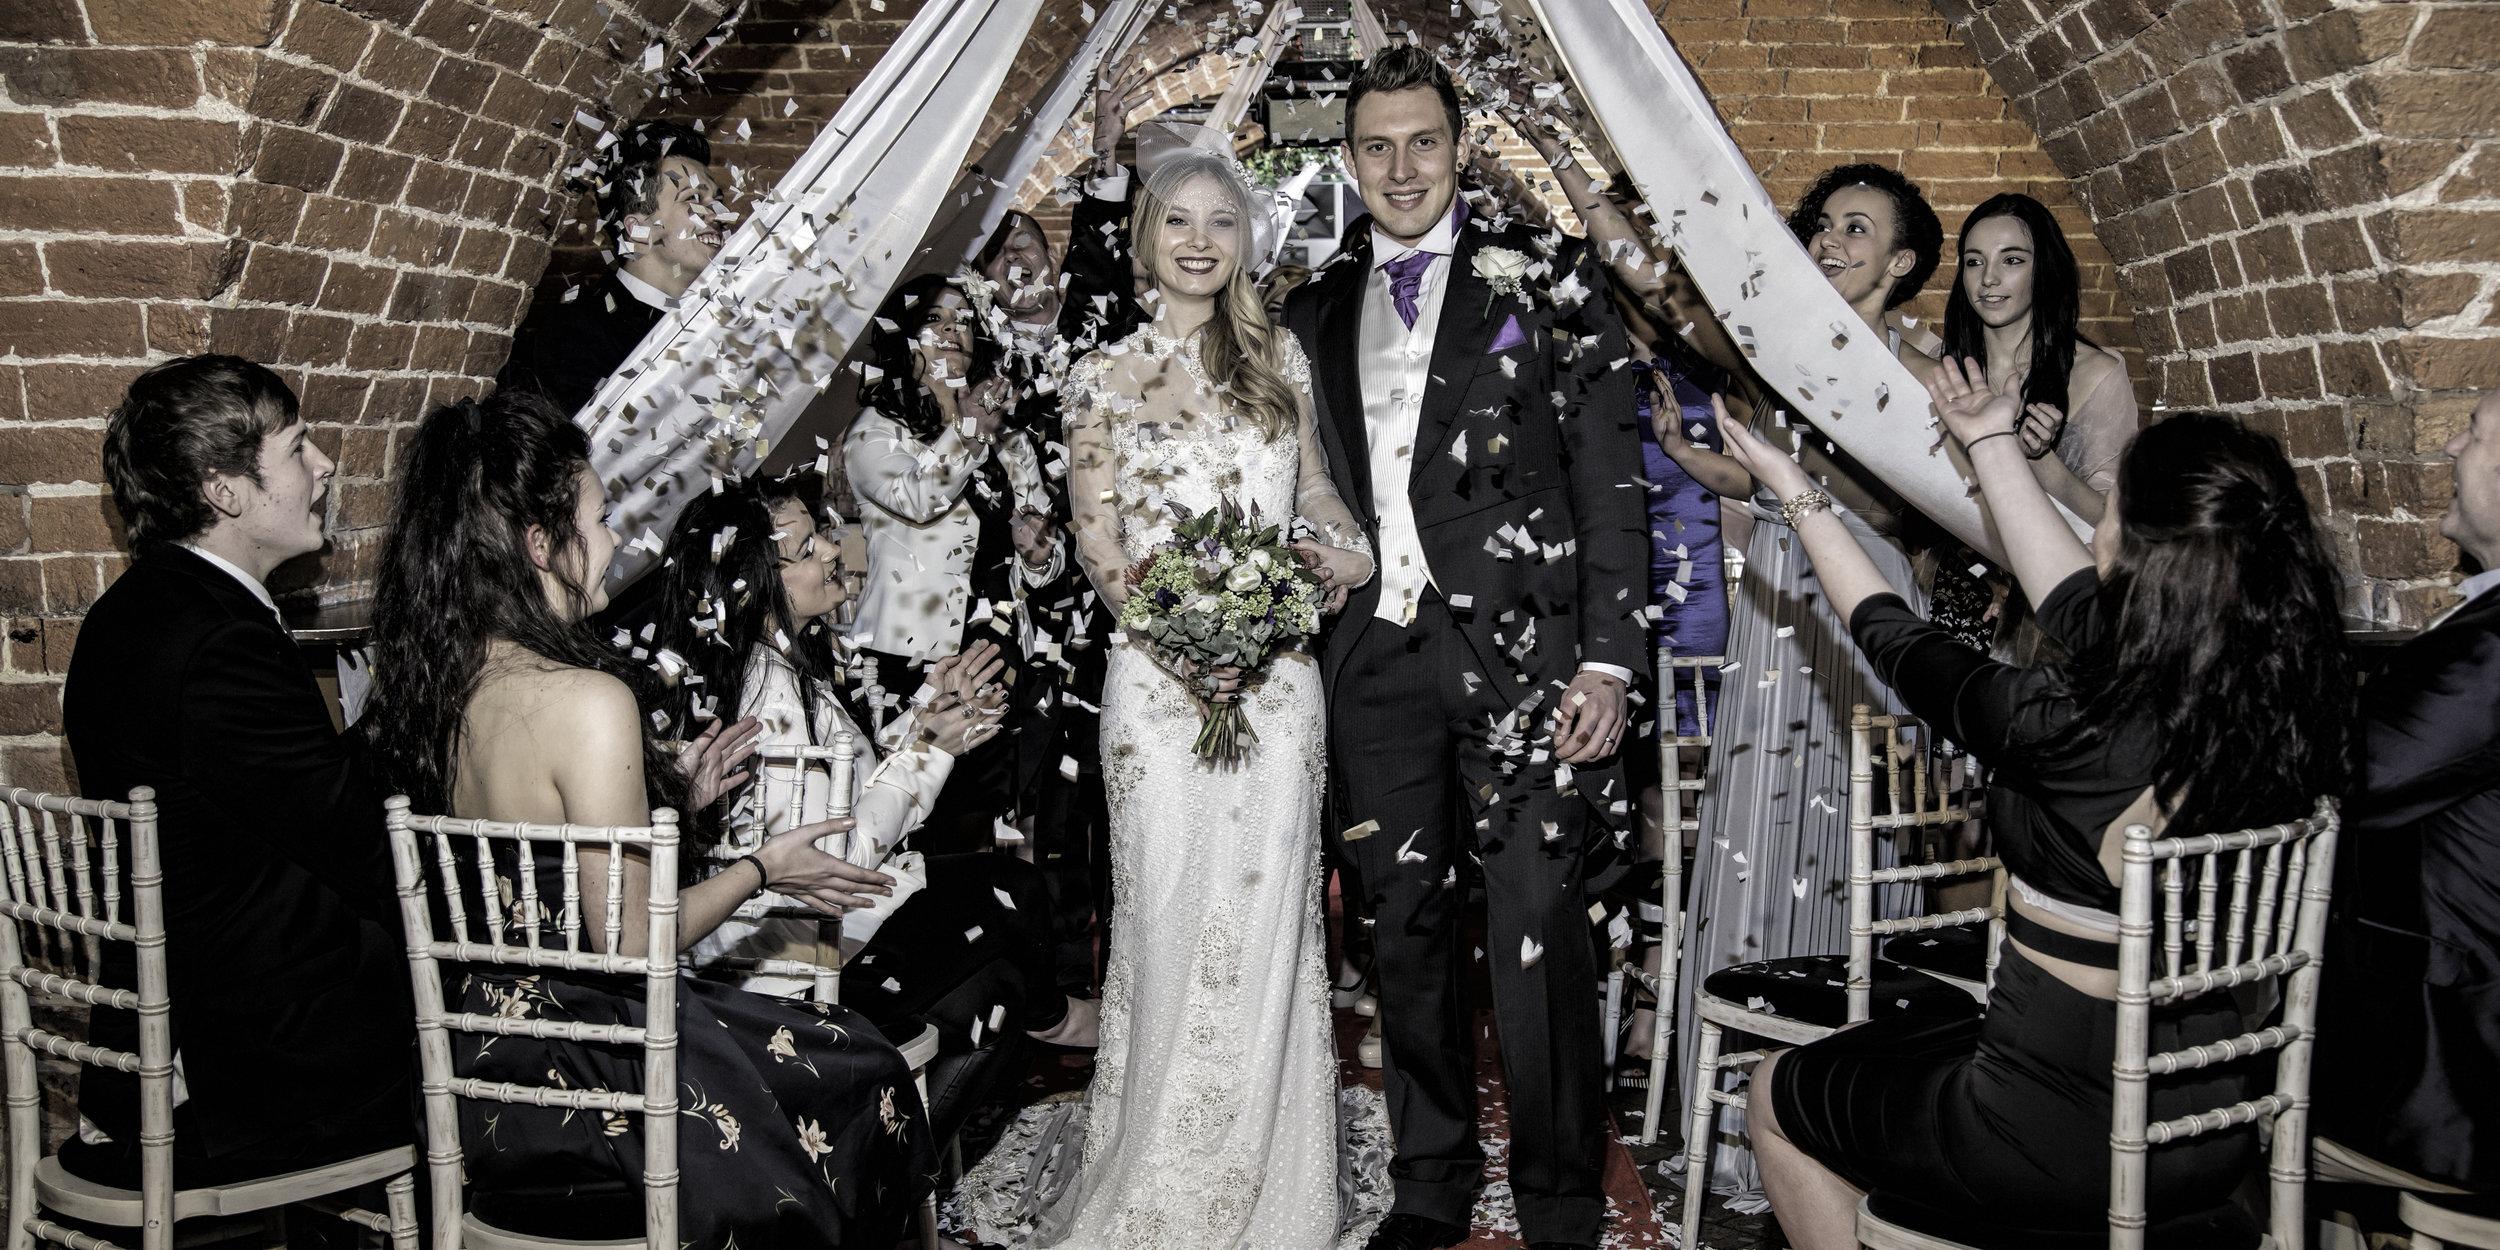 buttermarket_wedding_shoot_298-Edit-2.jpg